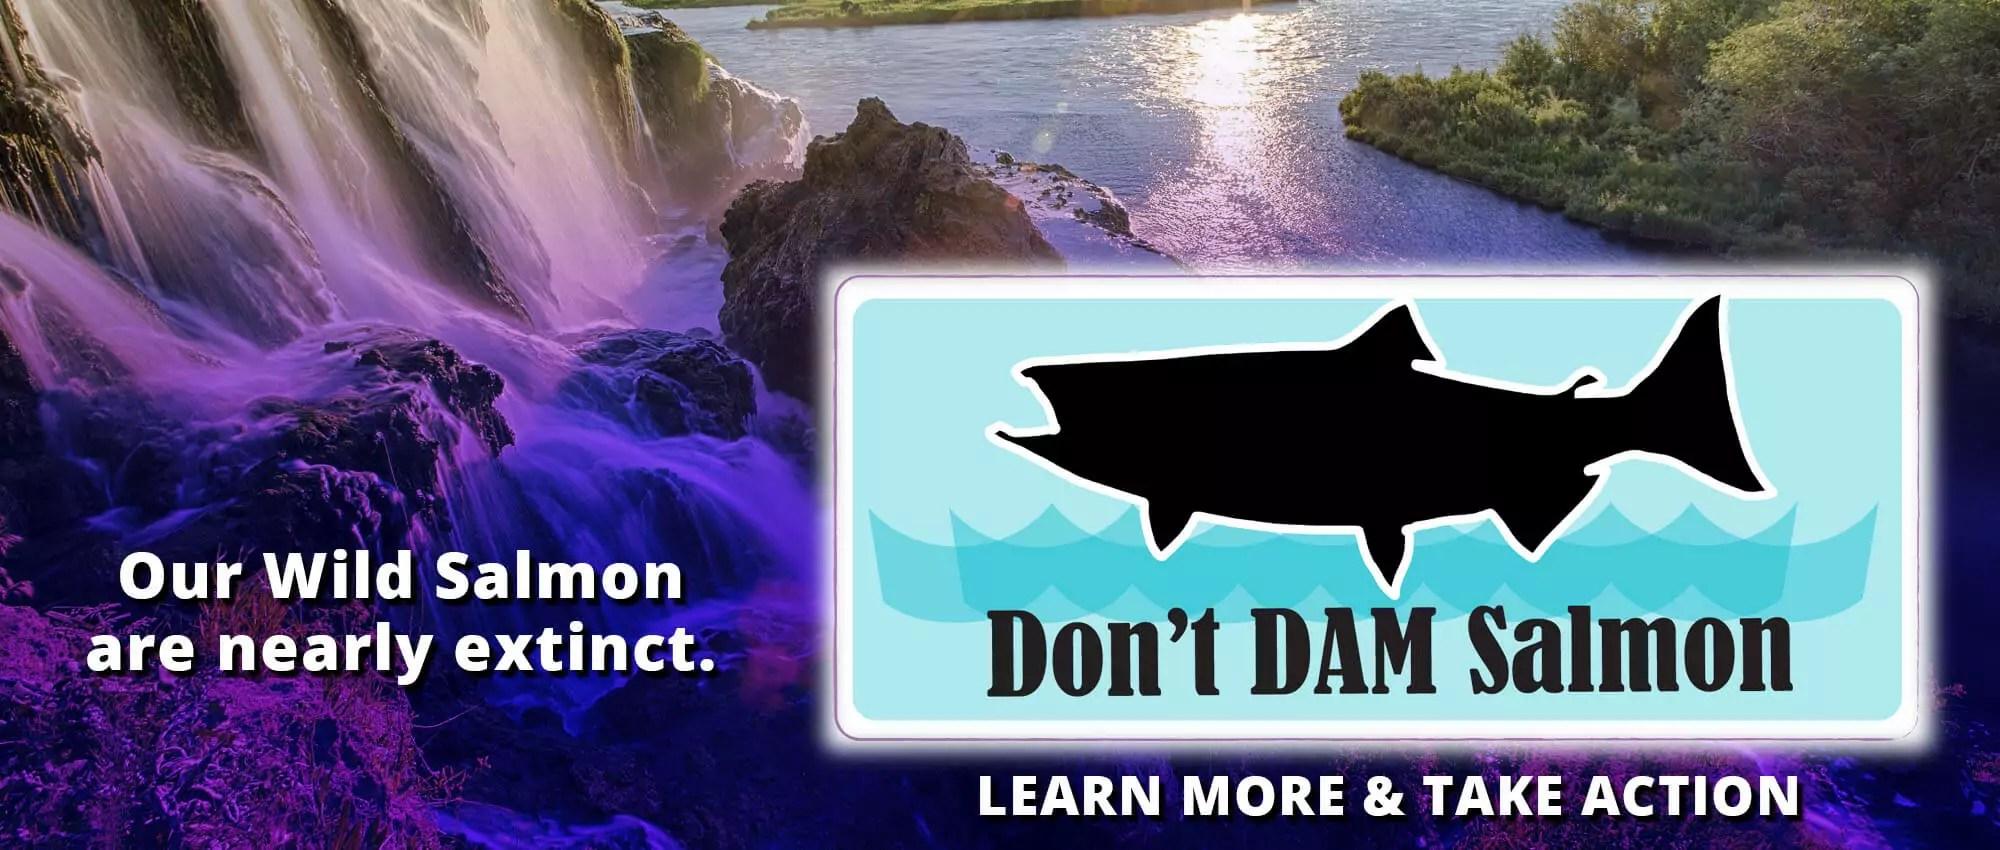 2019Don't Dam Salmon